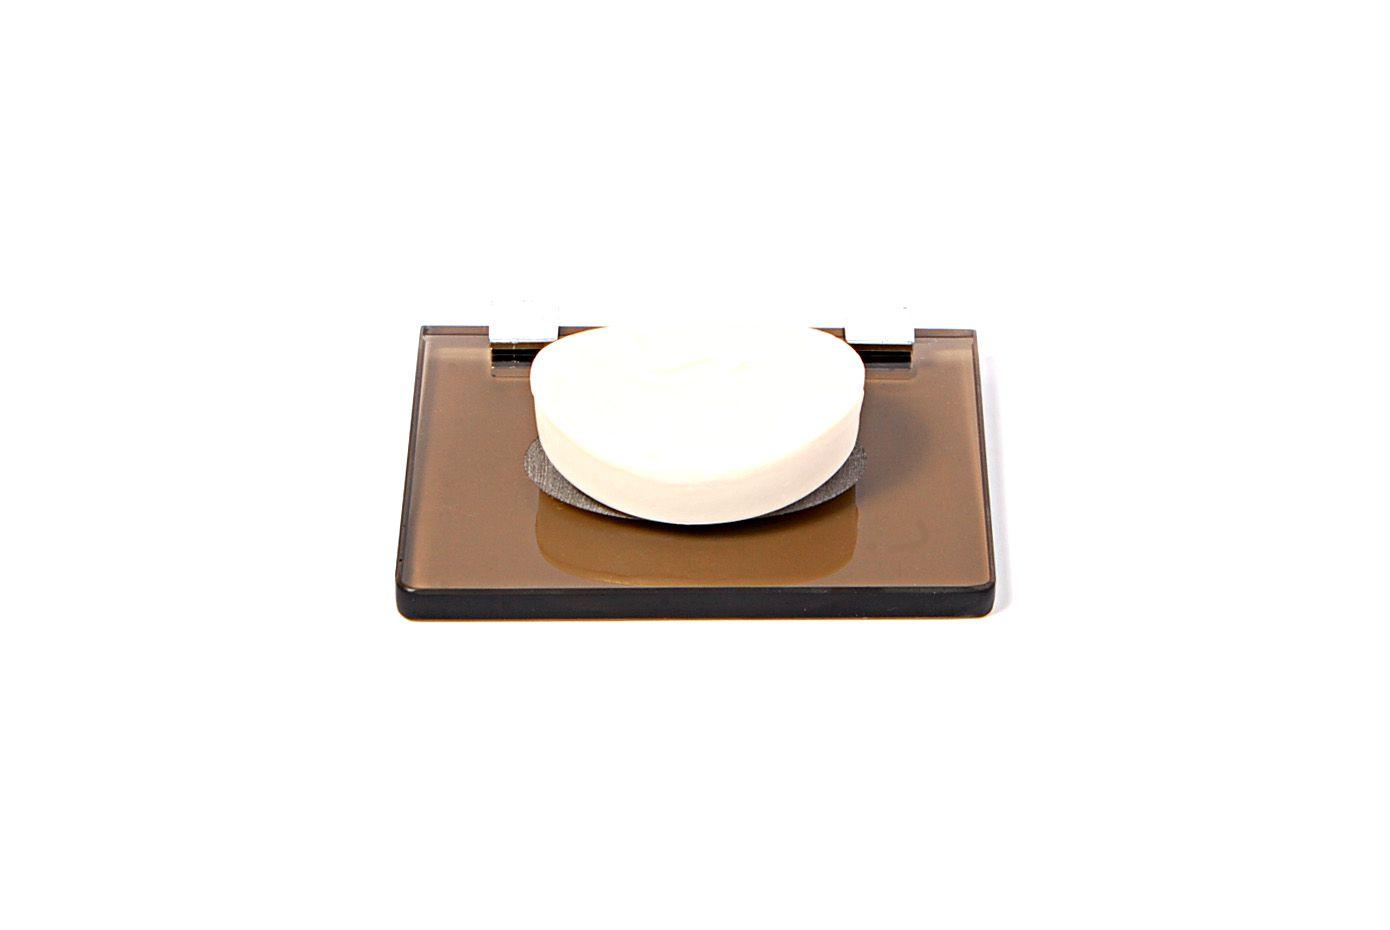 Saboneteira em Vidro Bronze Lapidado - Aquabox  - 14cmx9cmx8mm.